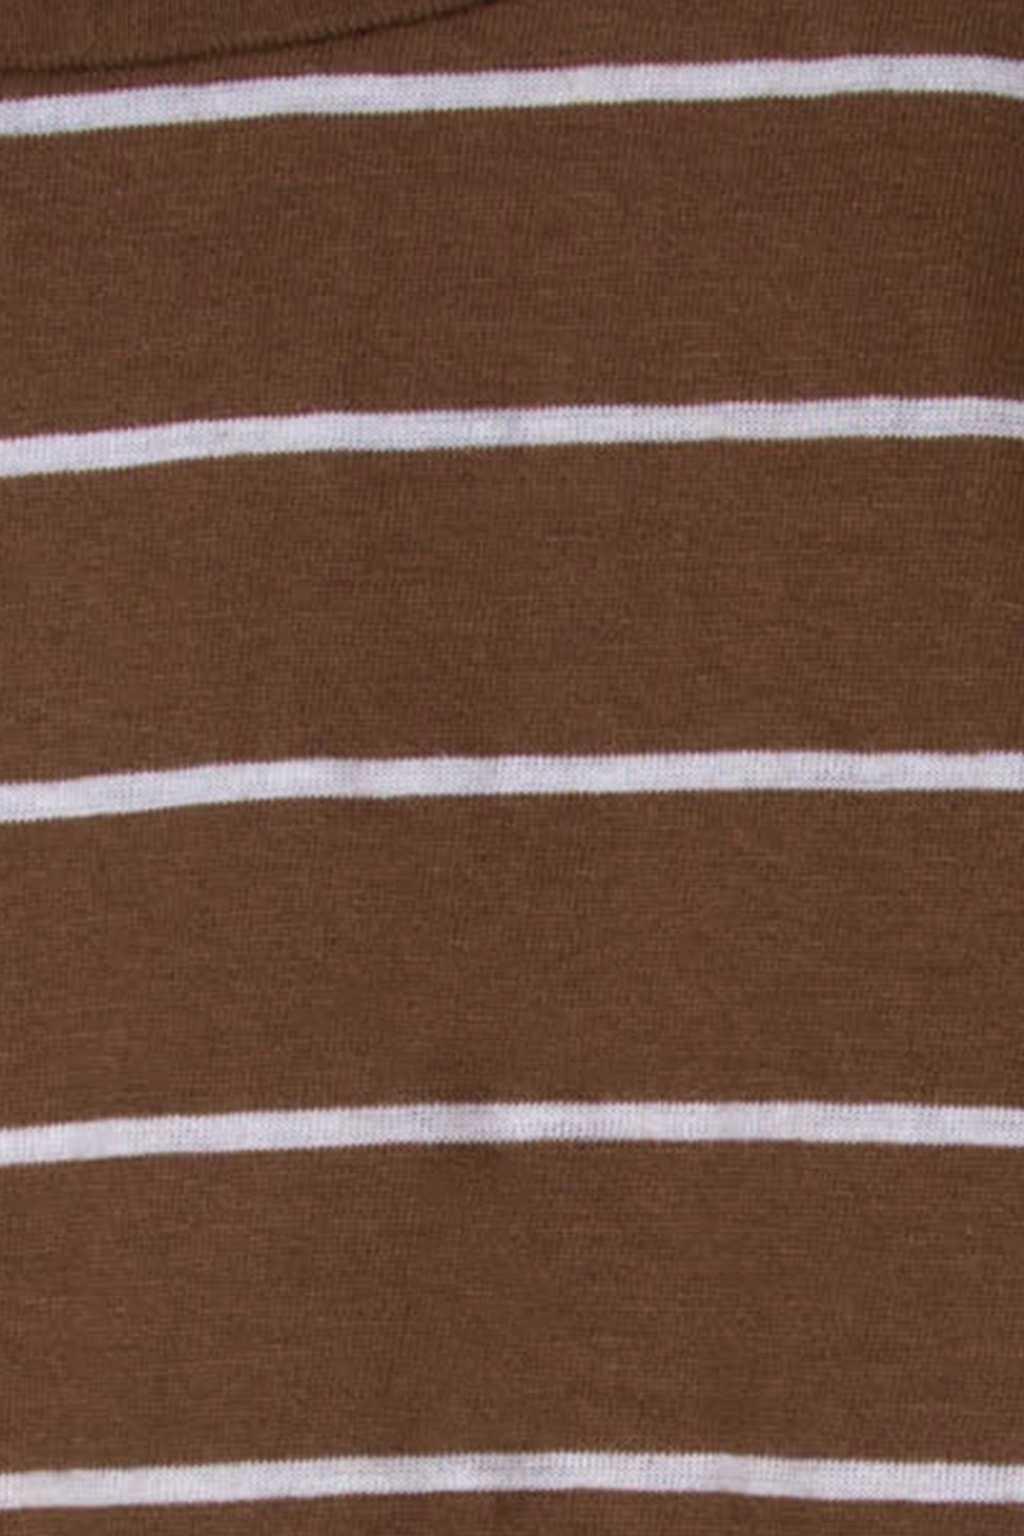 TShirt H320 Brown 6